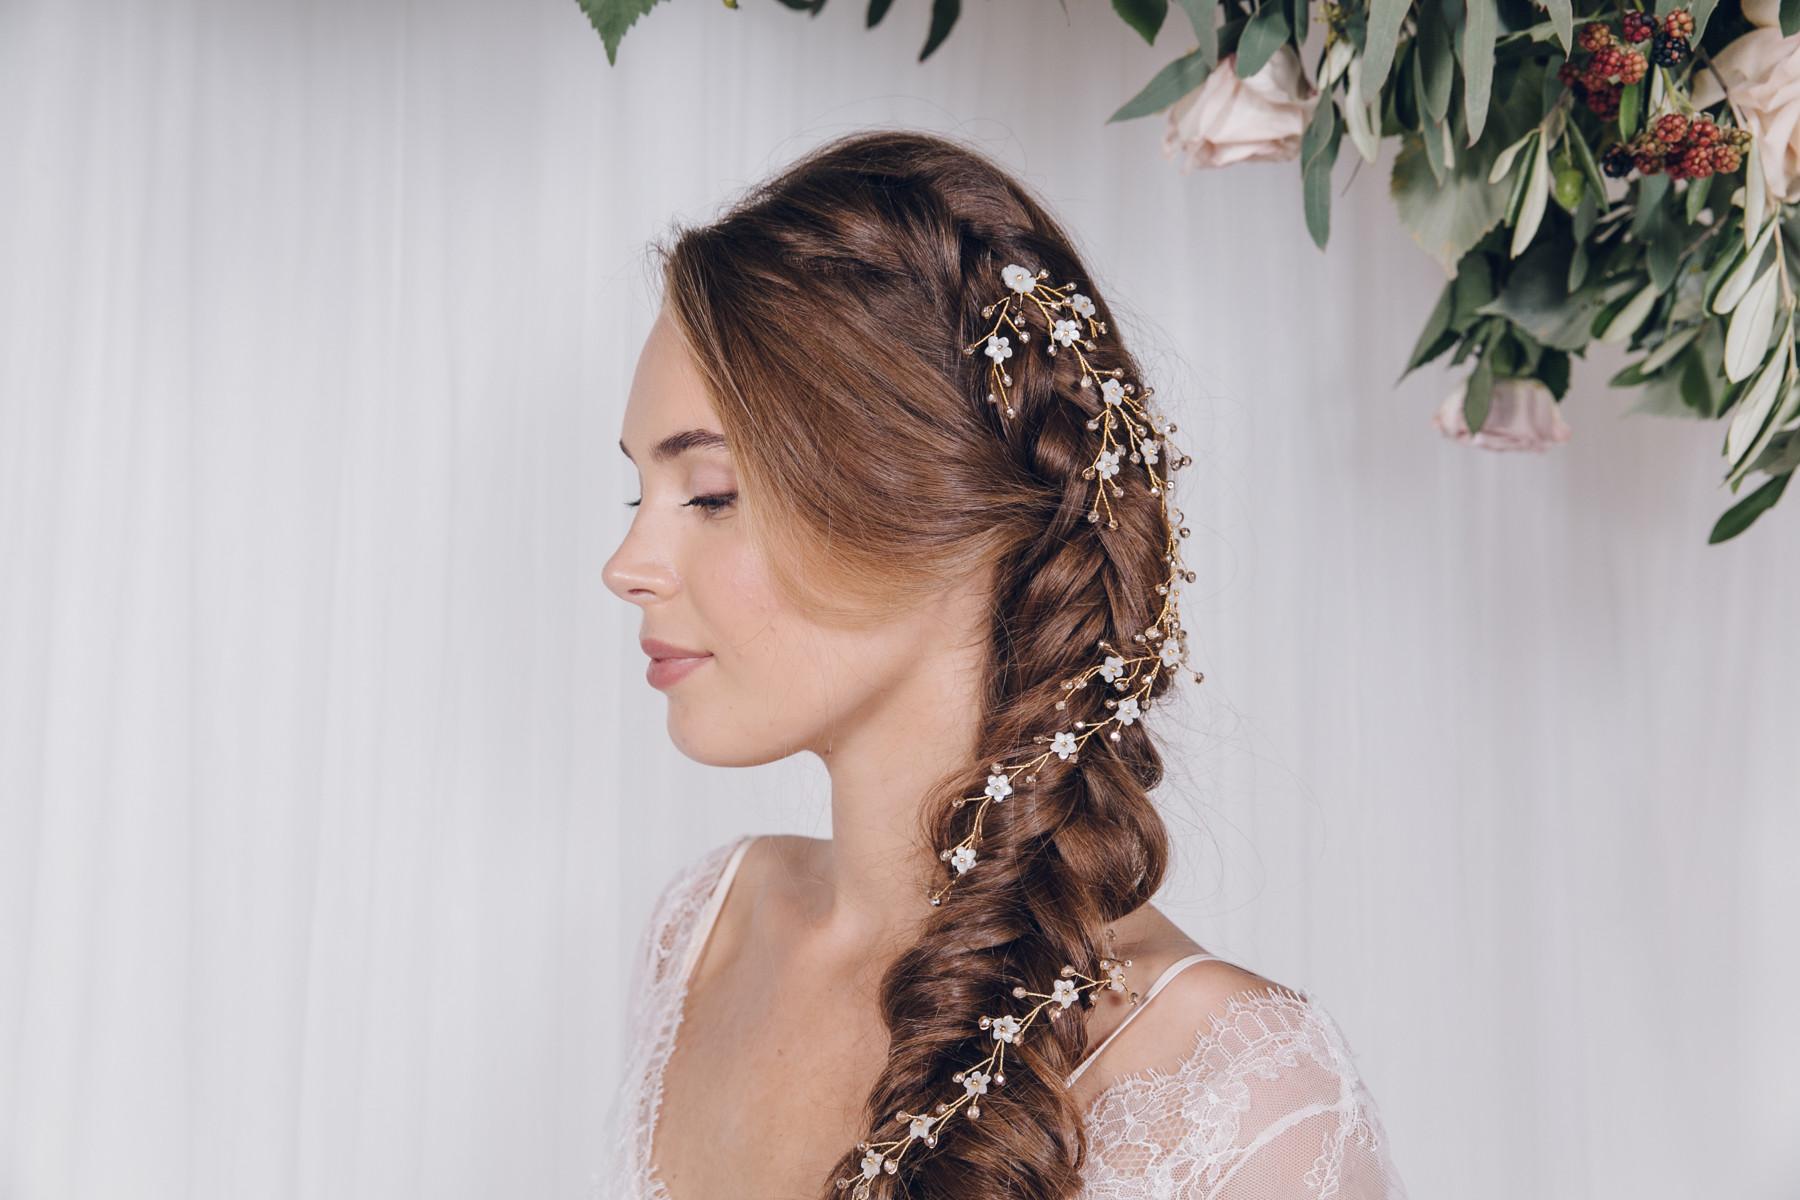 Annette_and_Isabella_hair_vines_gold_in_bridal_braid_plait_4.jpg